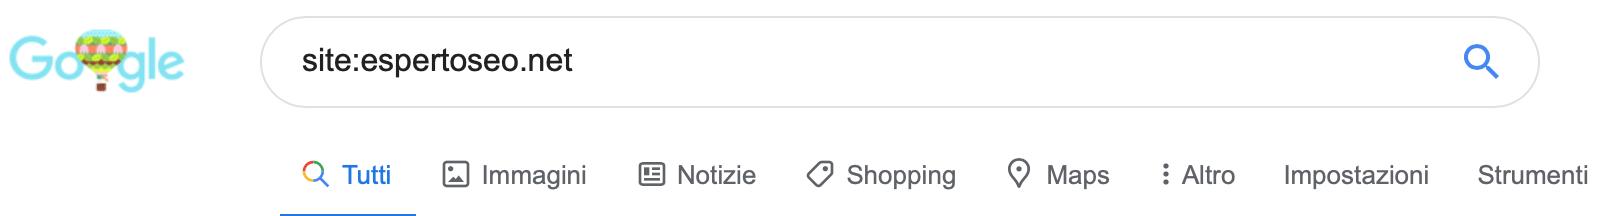 Ricerca site Google